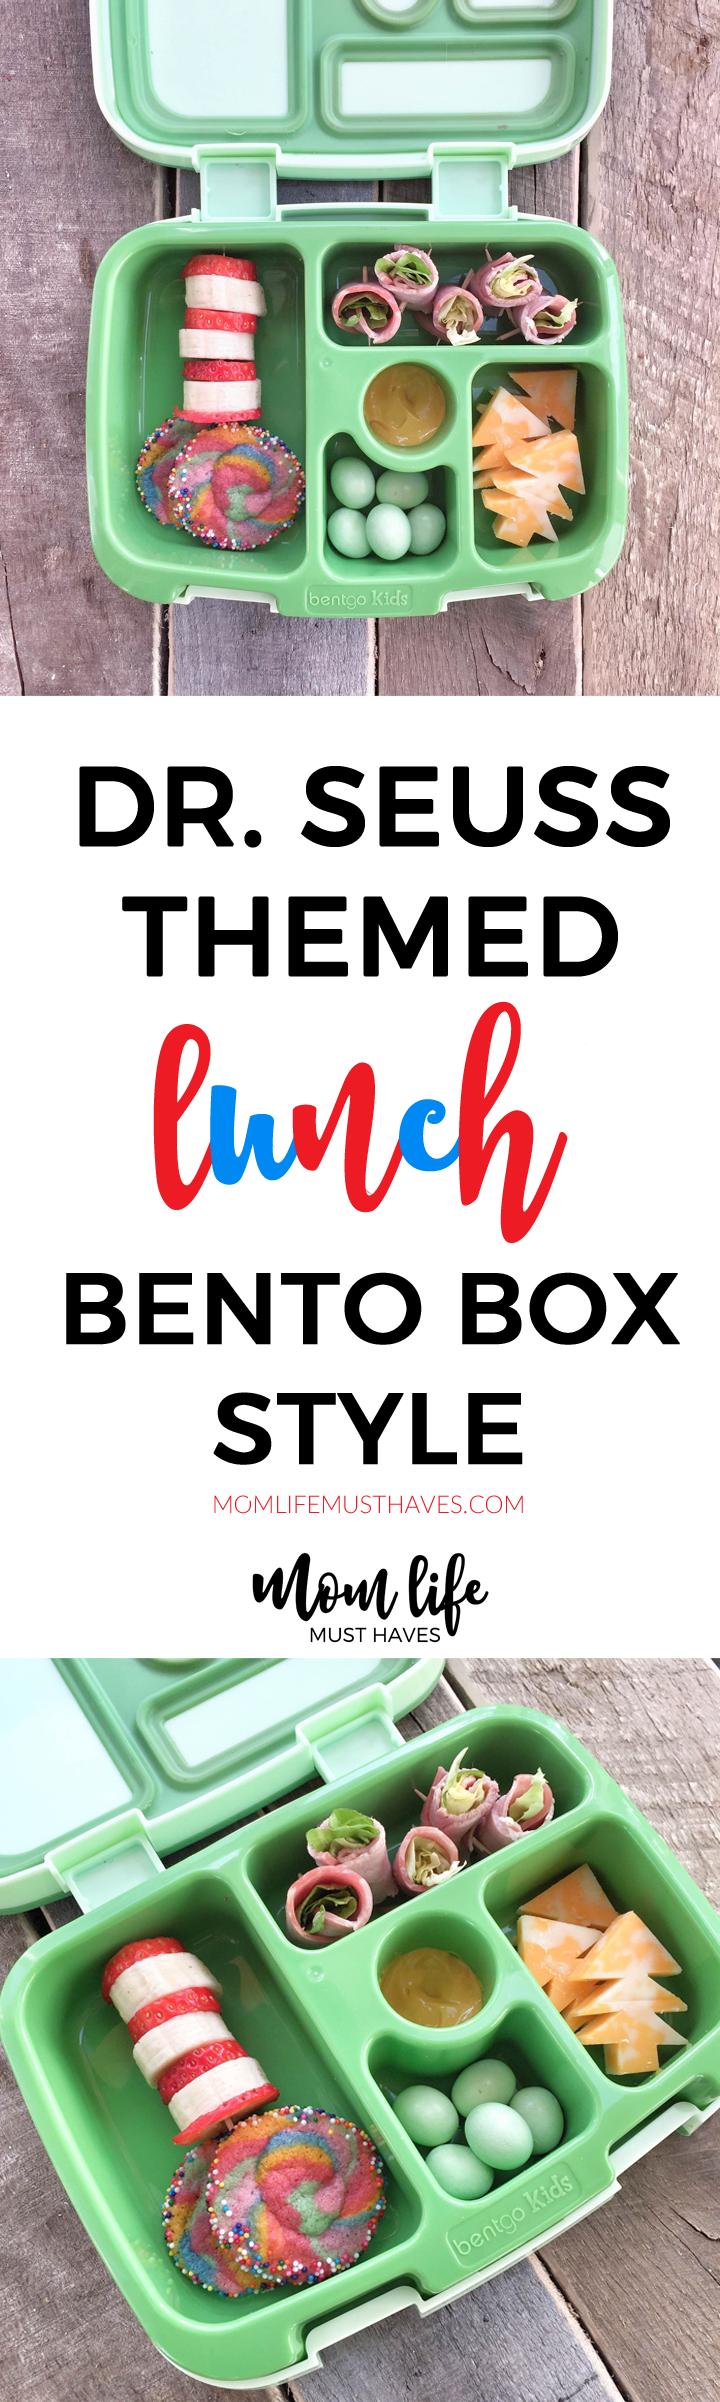 Dr. Seuss bento box lunch for kids! momlifemusthaves.com